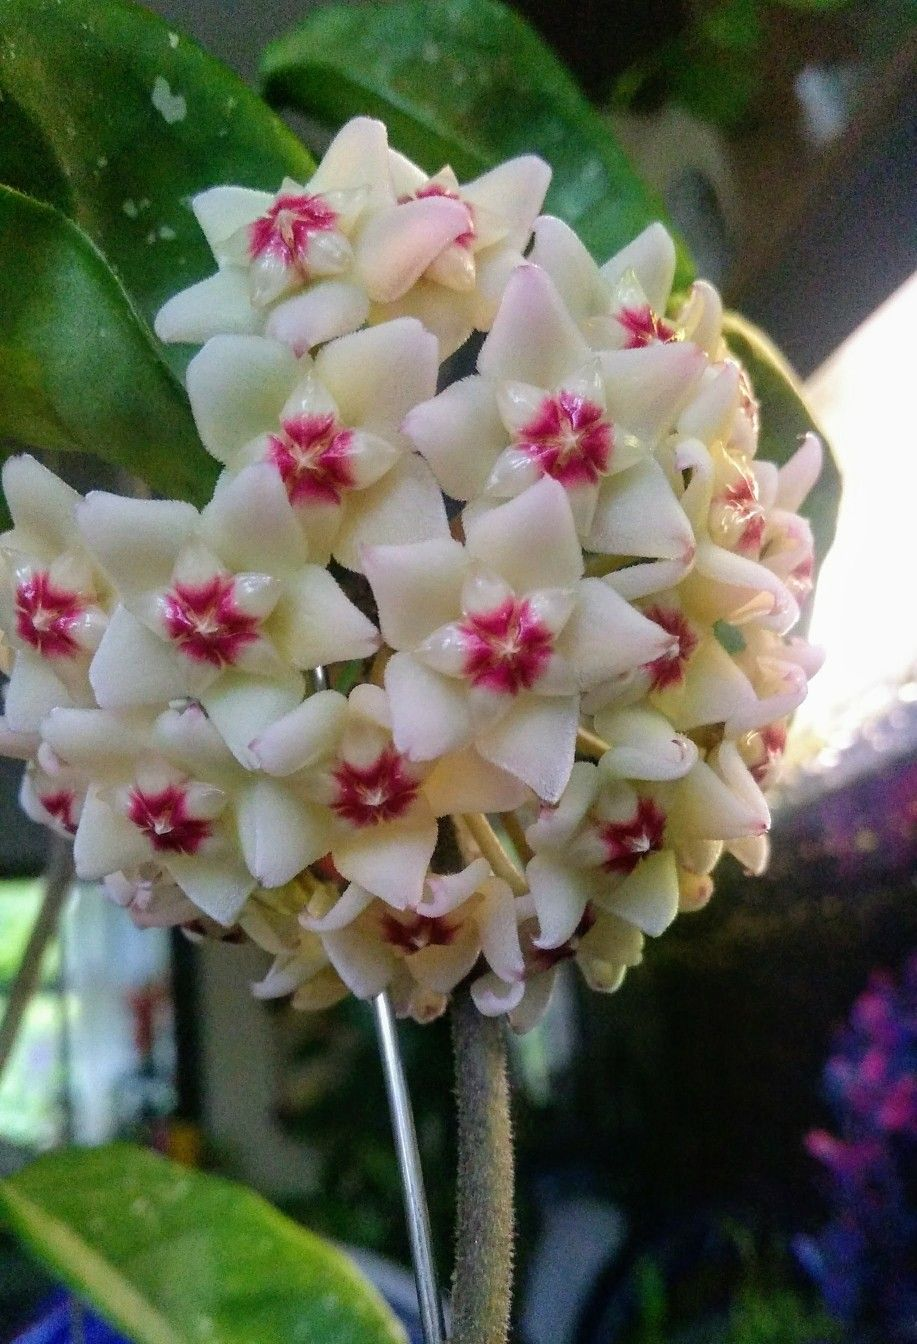 HOYA CARNOSA Krimson Queen-bellissima Porcellana Fiore//fiore cera